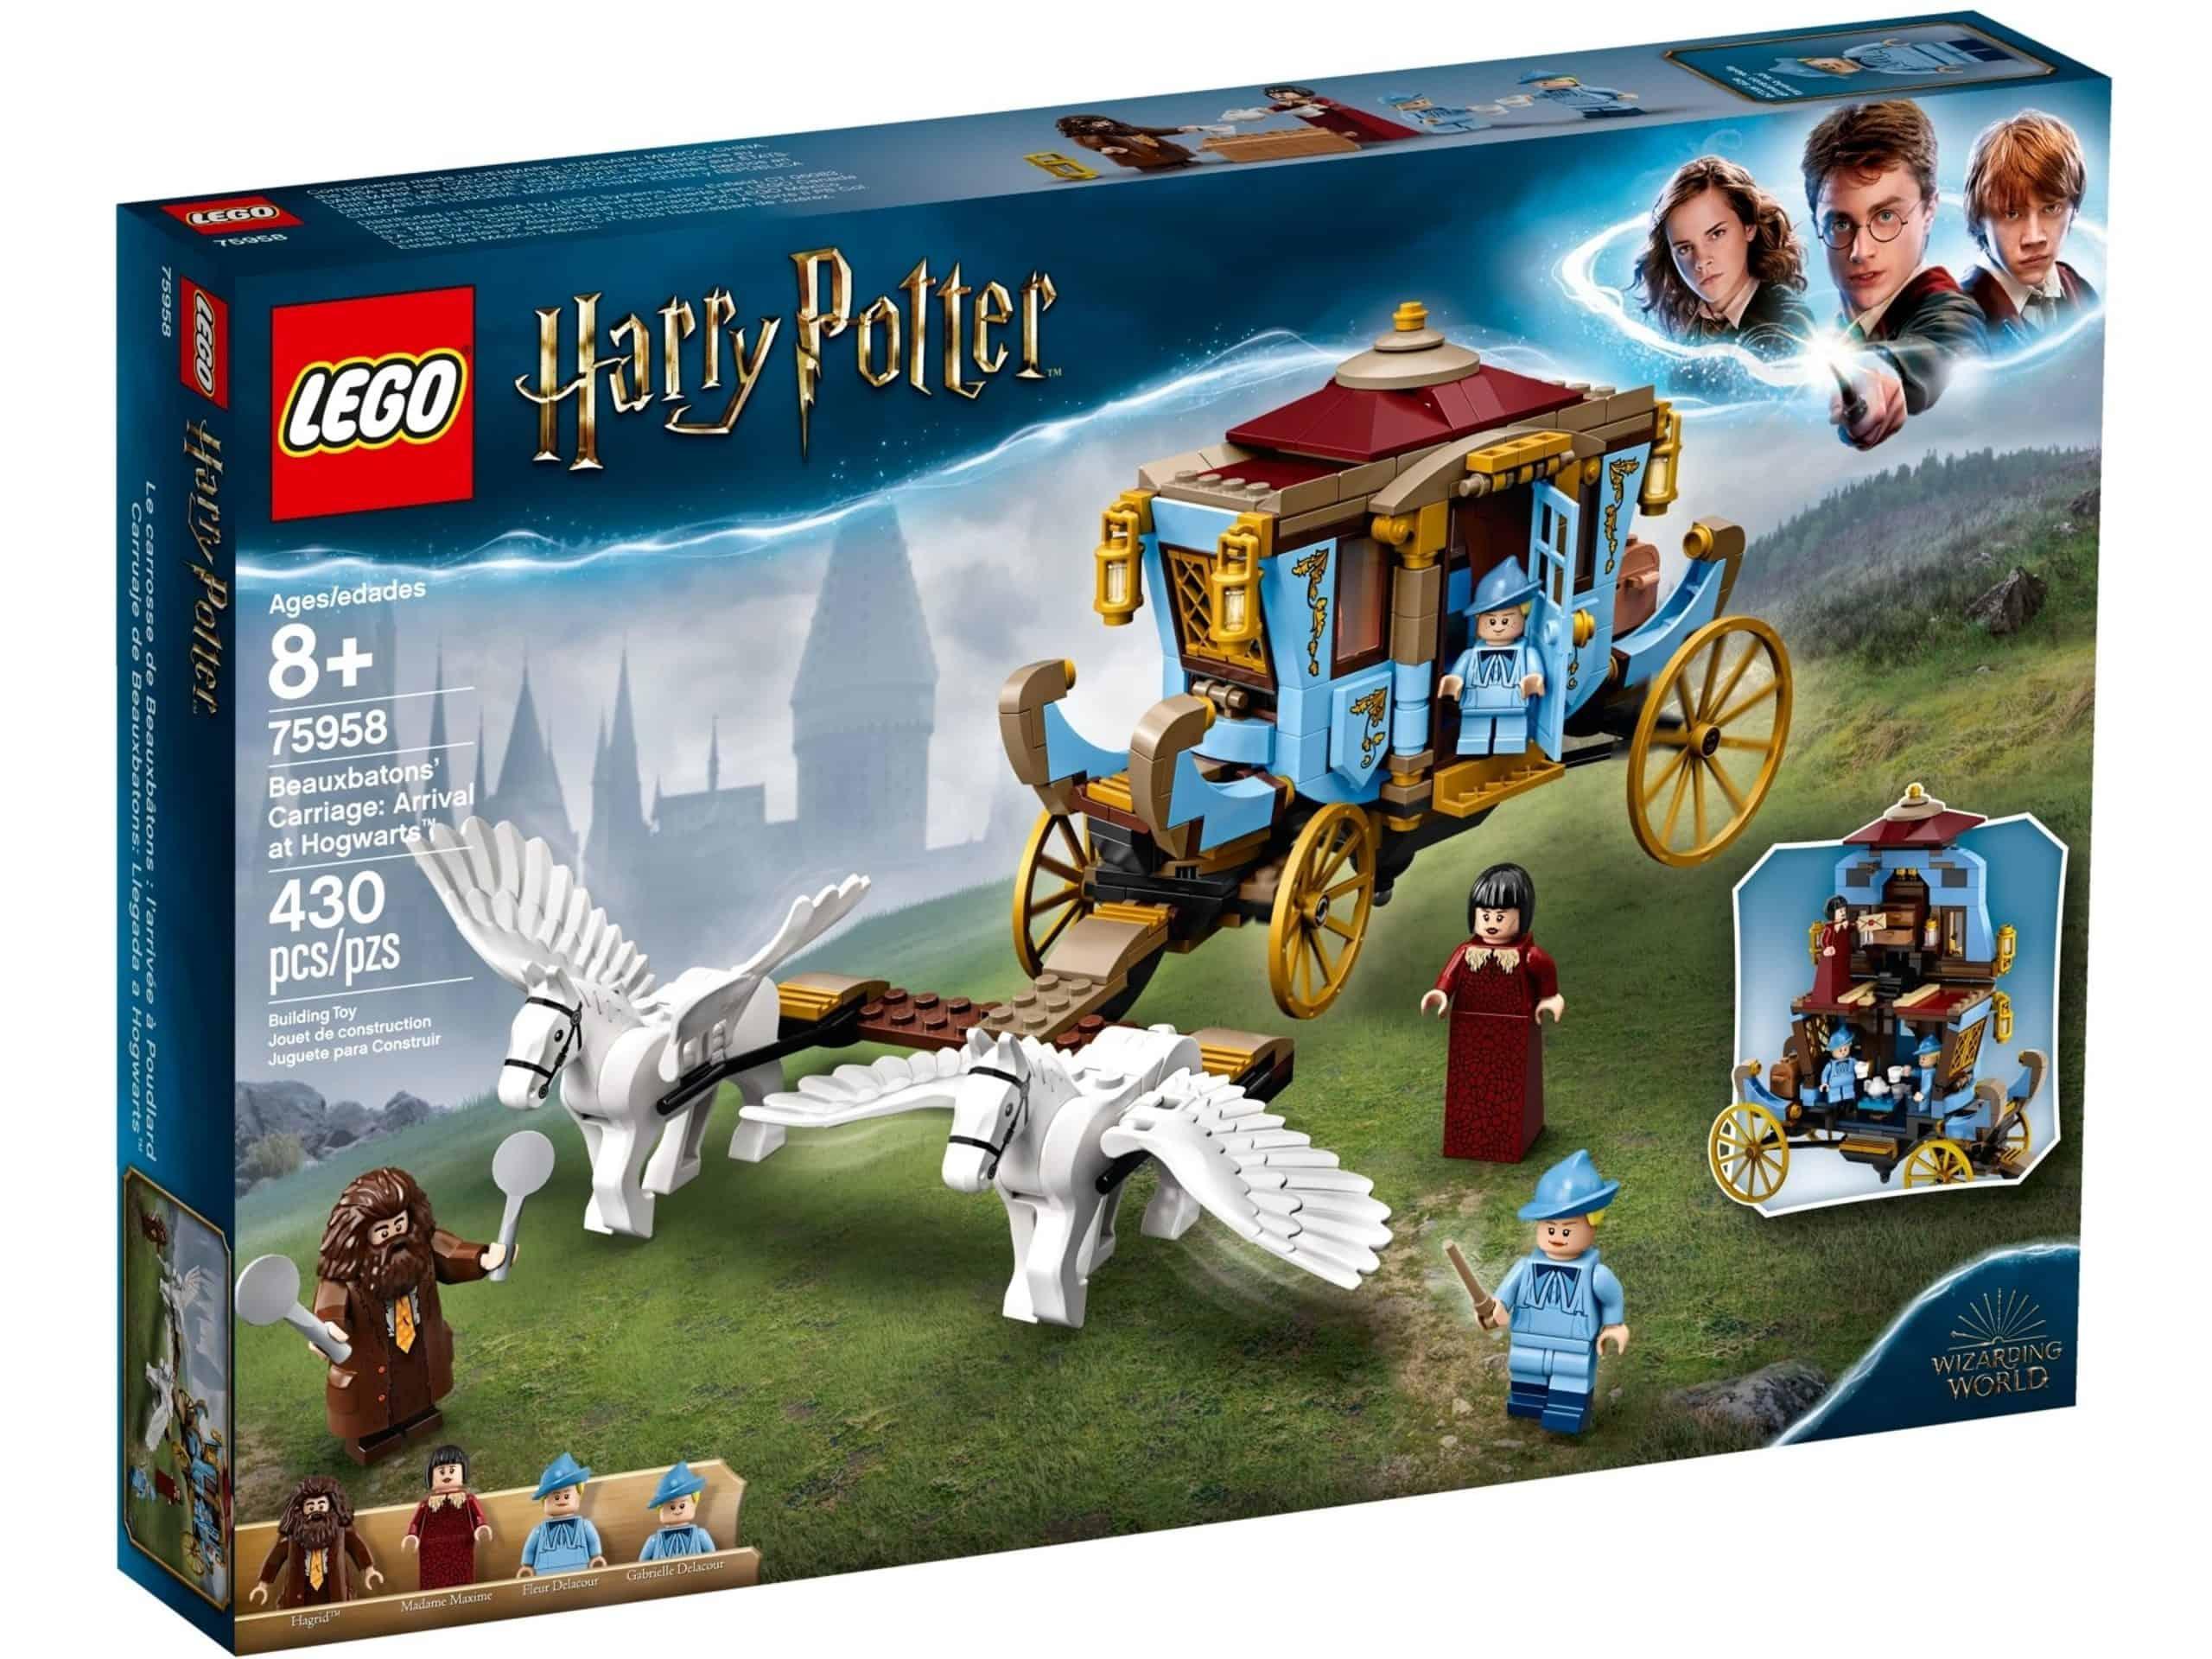 lego 75958 kutsche von beauxbatons ankunft in hogwarts scaled